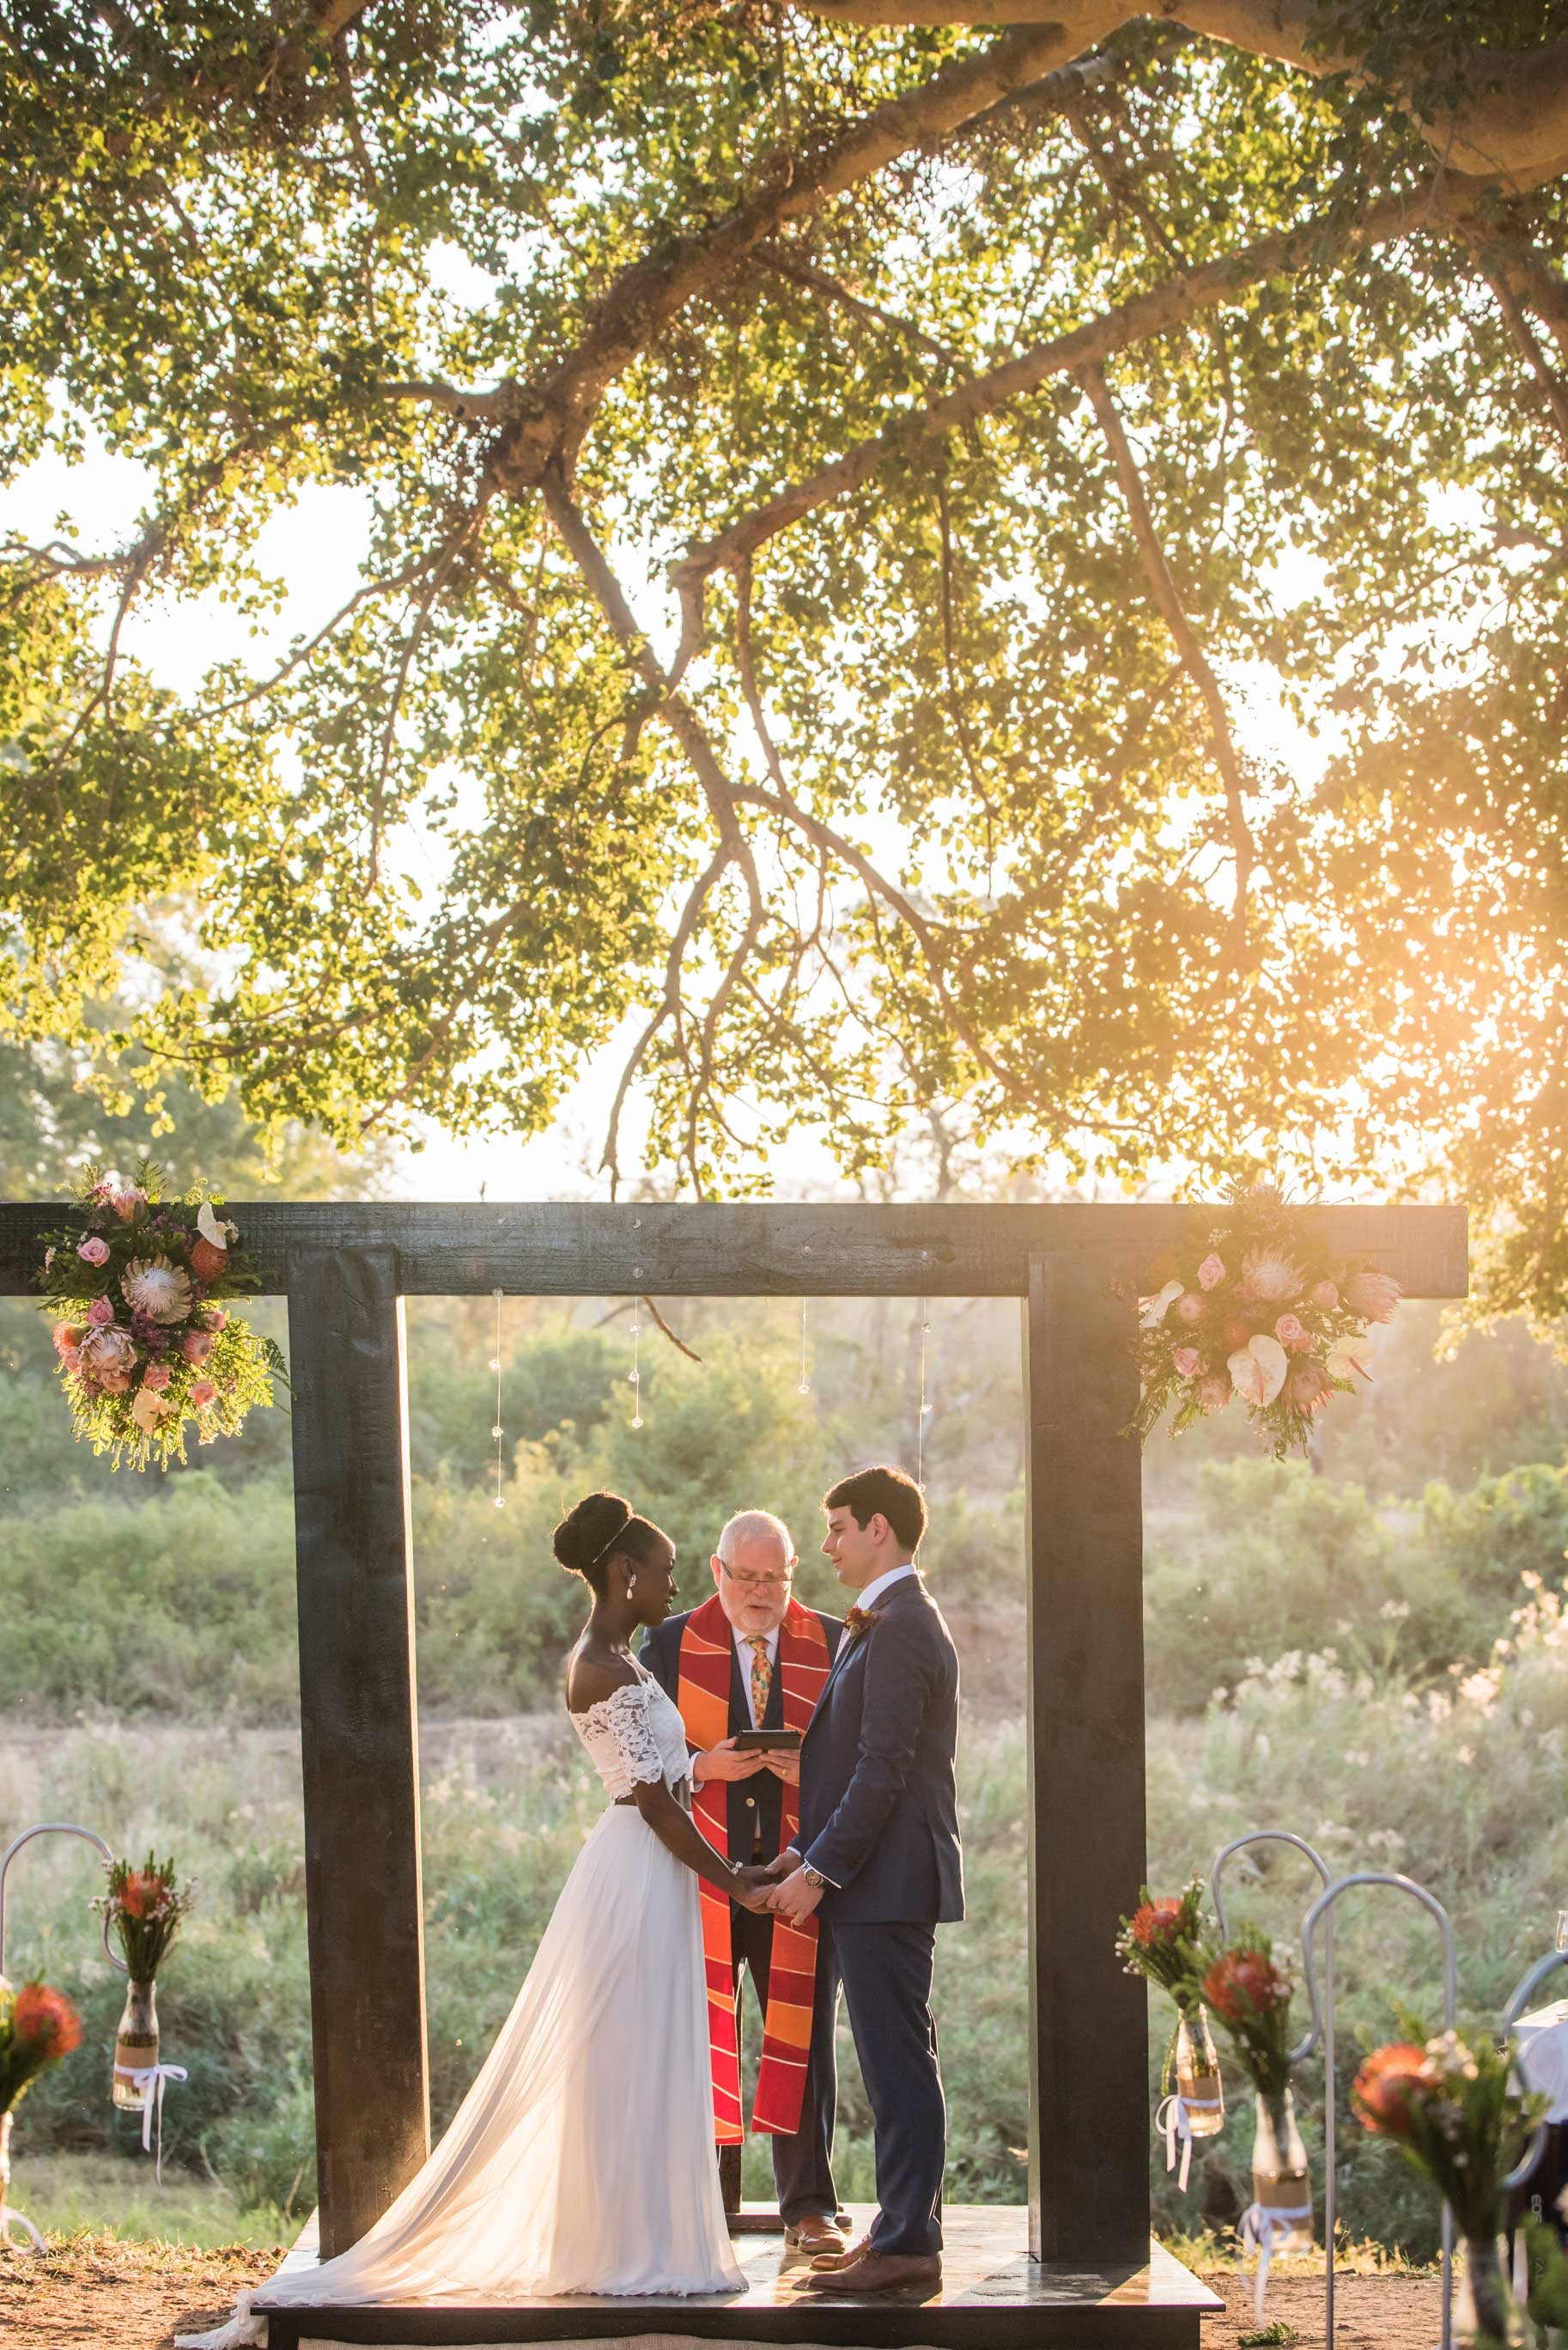 south-africa-destination-wedding-ronnie-bliss-photo-290.jpg